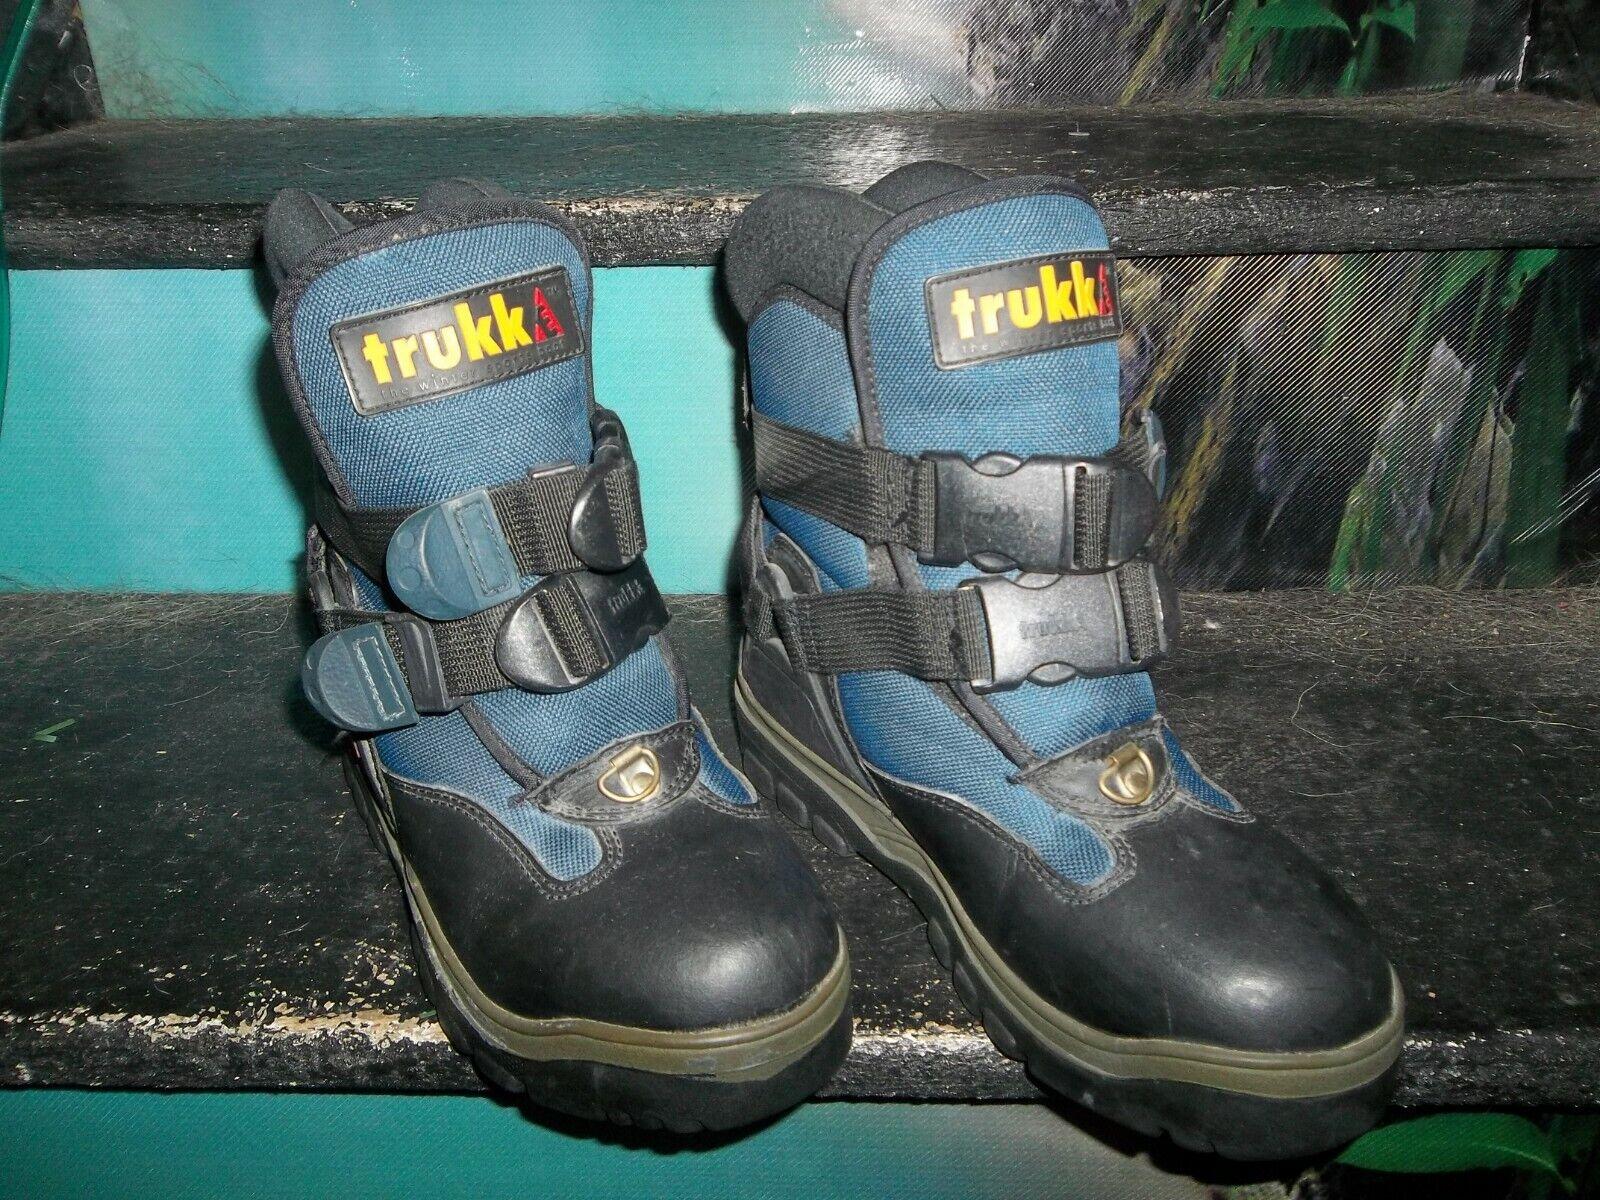 Trukke  botas De Nieve Unisex, clima frío, motos de nieve, Consiglio-esquí, raquetas de nieve